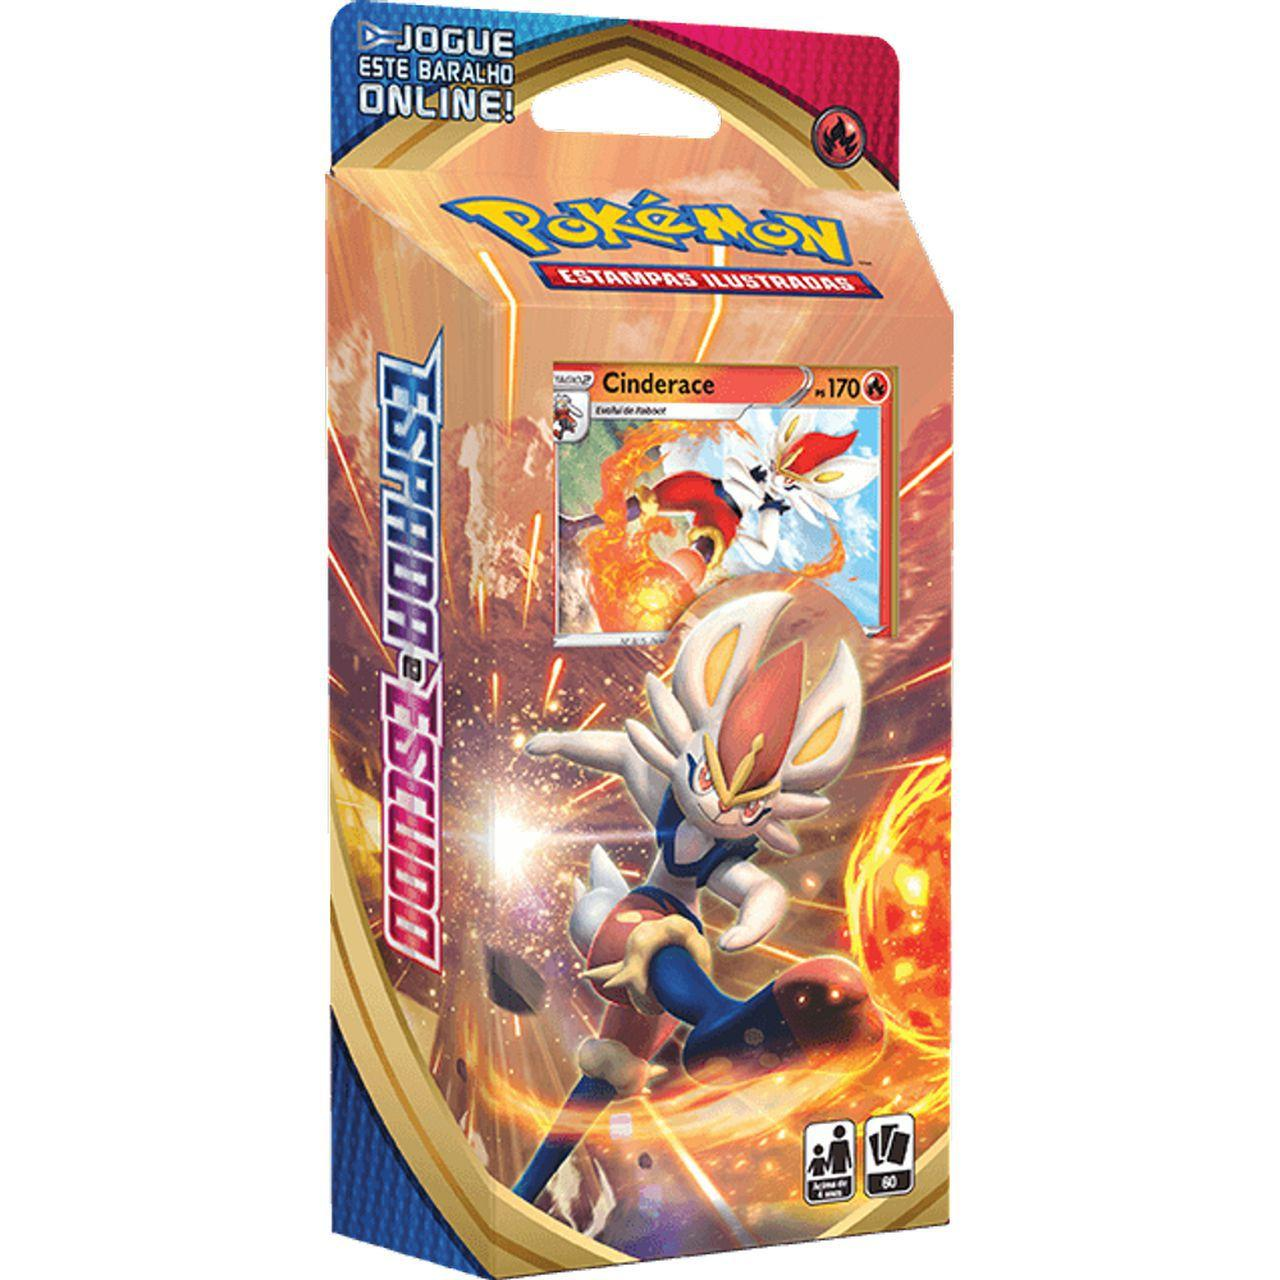 Deck Para Iniciante (Starter Deck) Card Pokémon: Espada e Escudo Cinderace - Pokémon